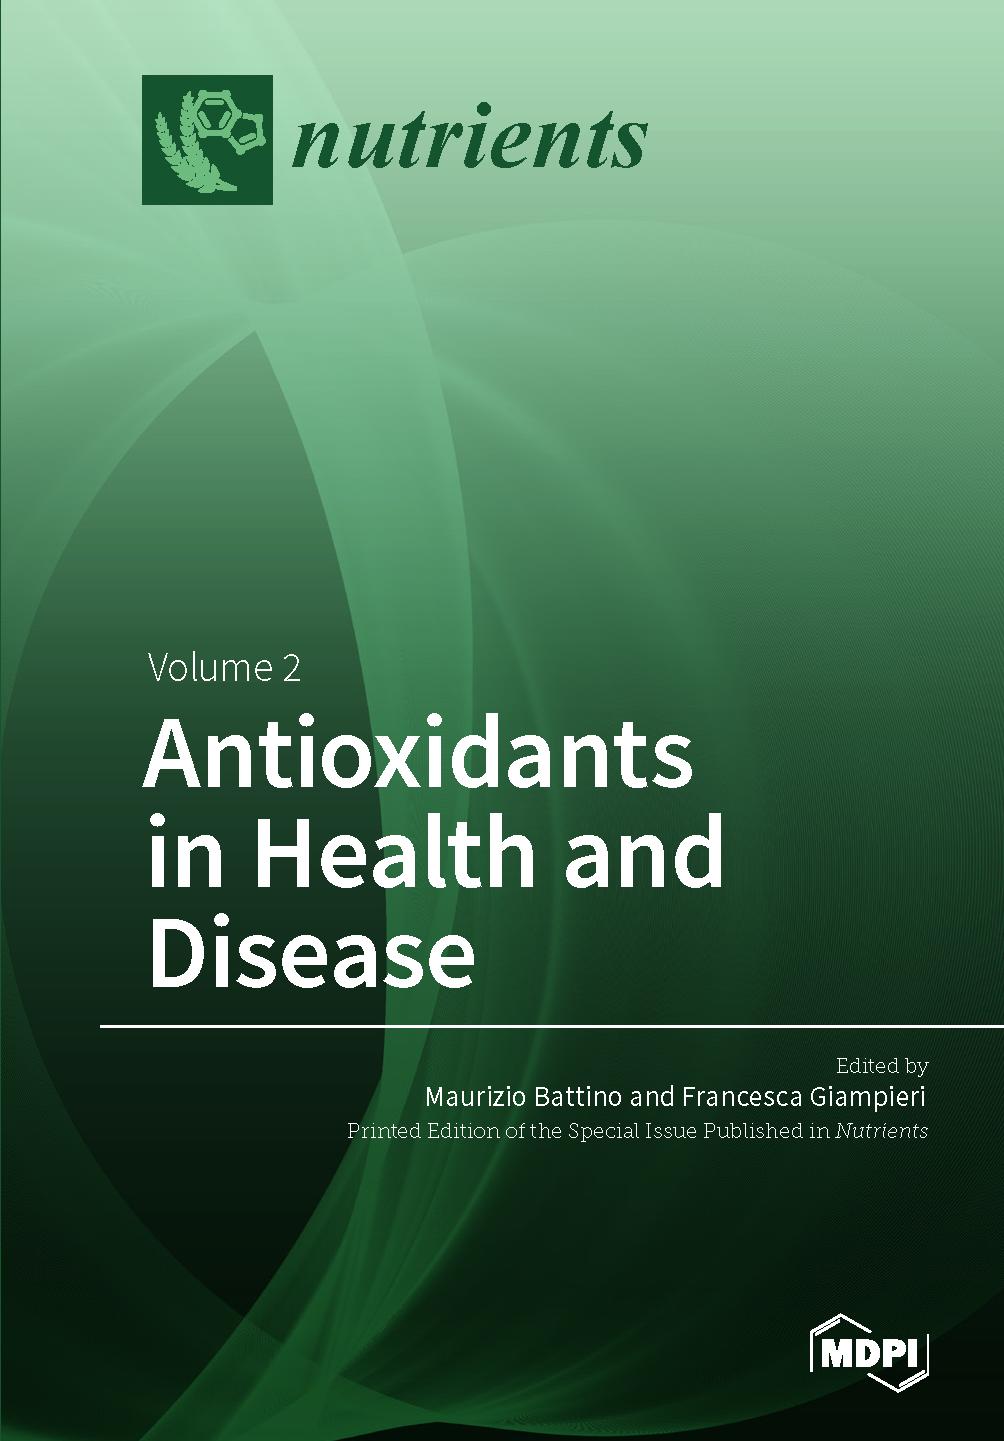 Antioxidants in Health and Disease